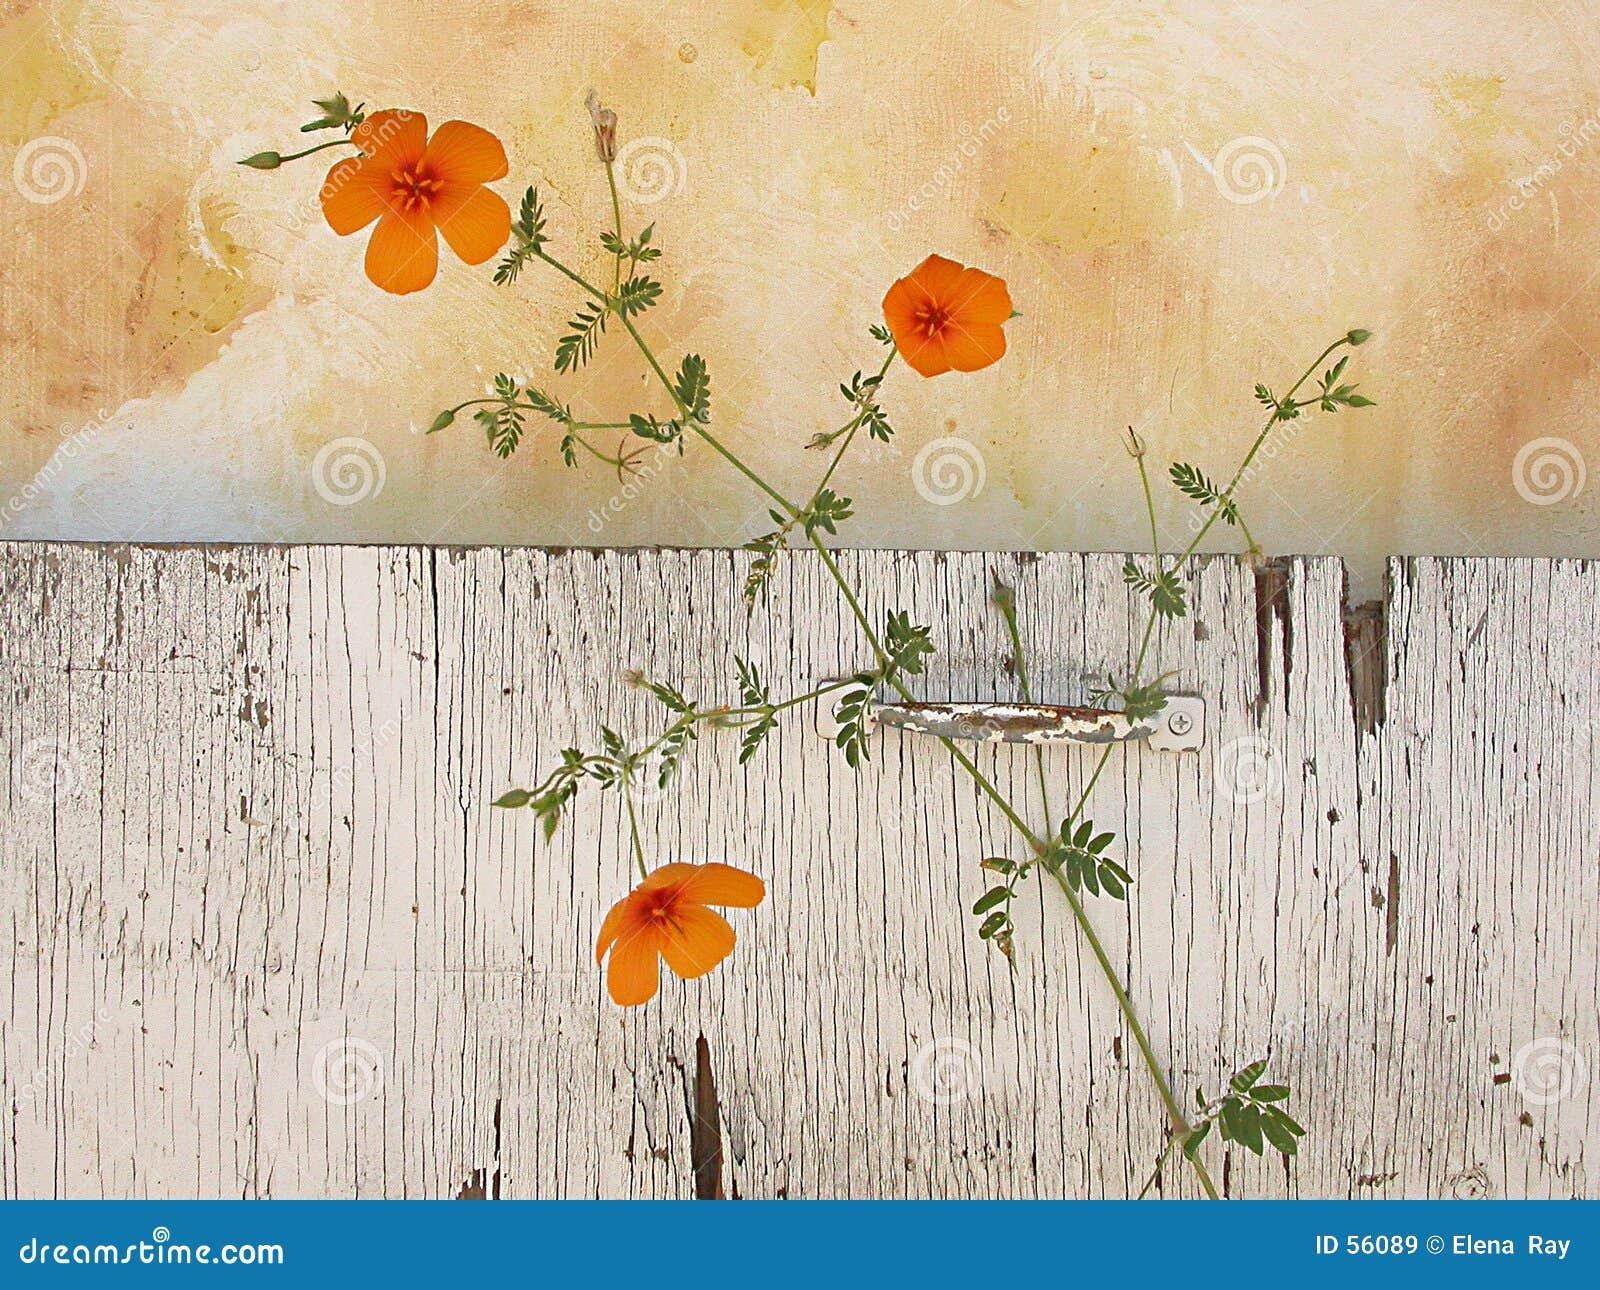 Download Wildflowers ζωής ακόμα στοκ εικόνα. εικόνα από φύση, ζωή - 56089